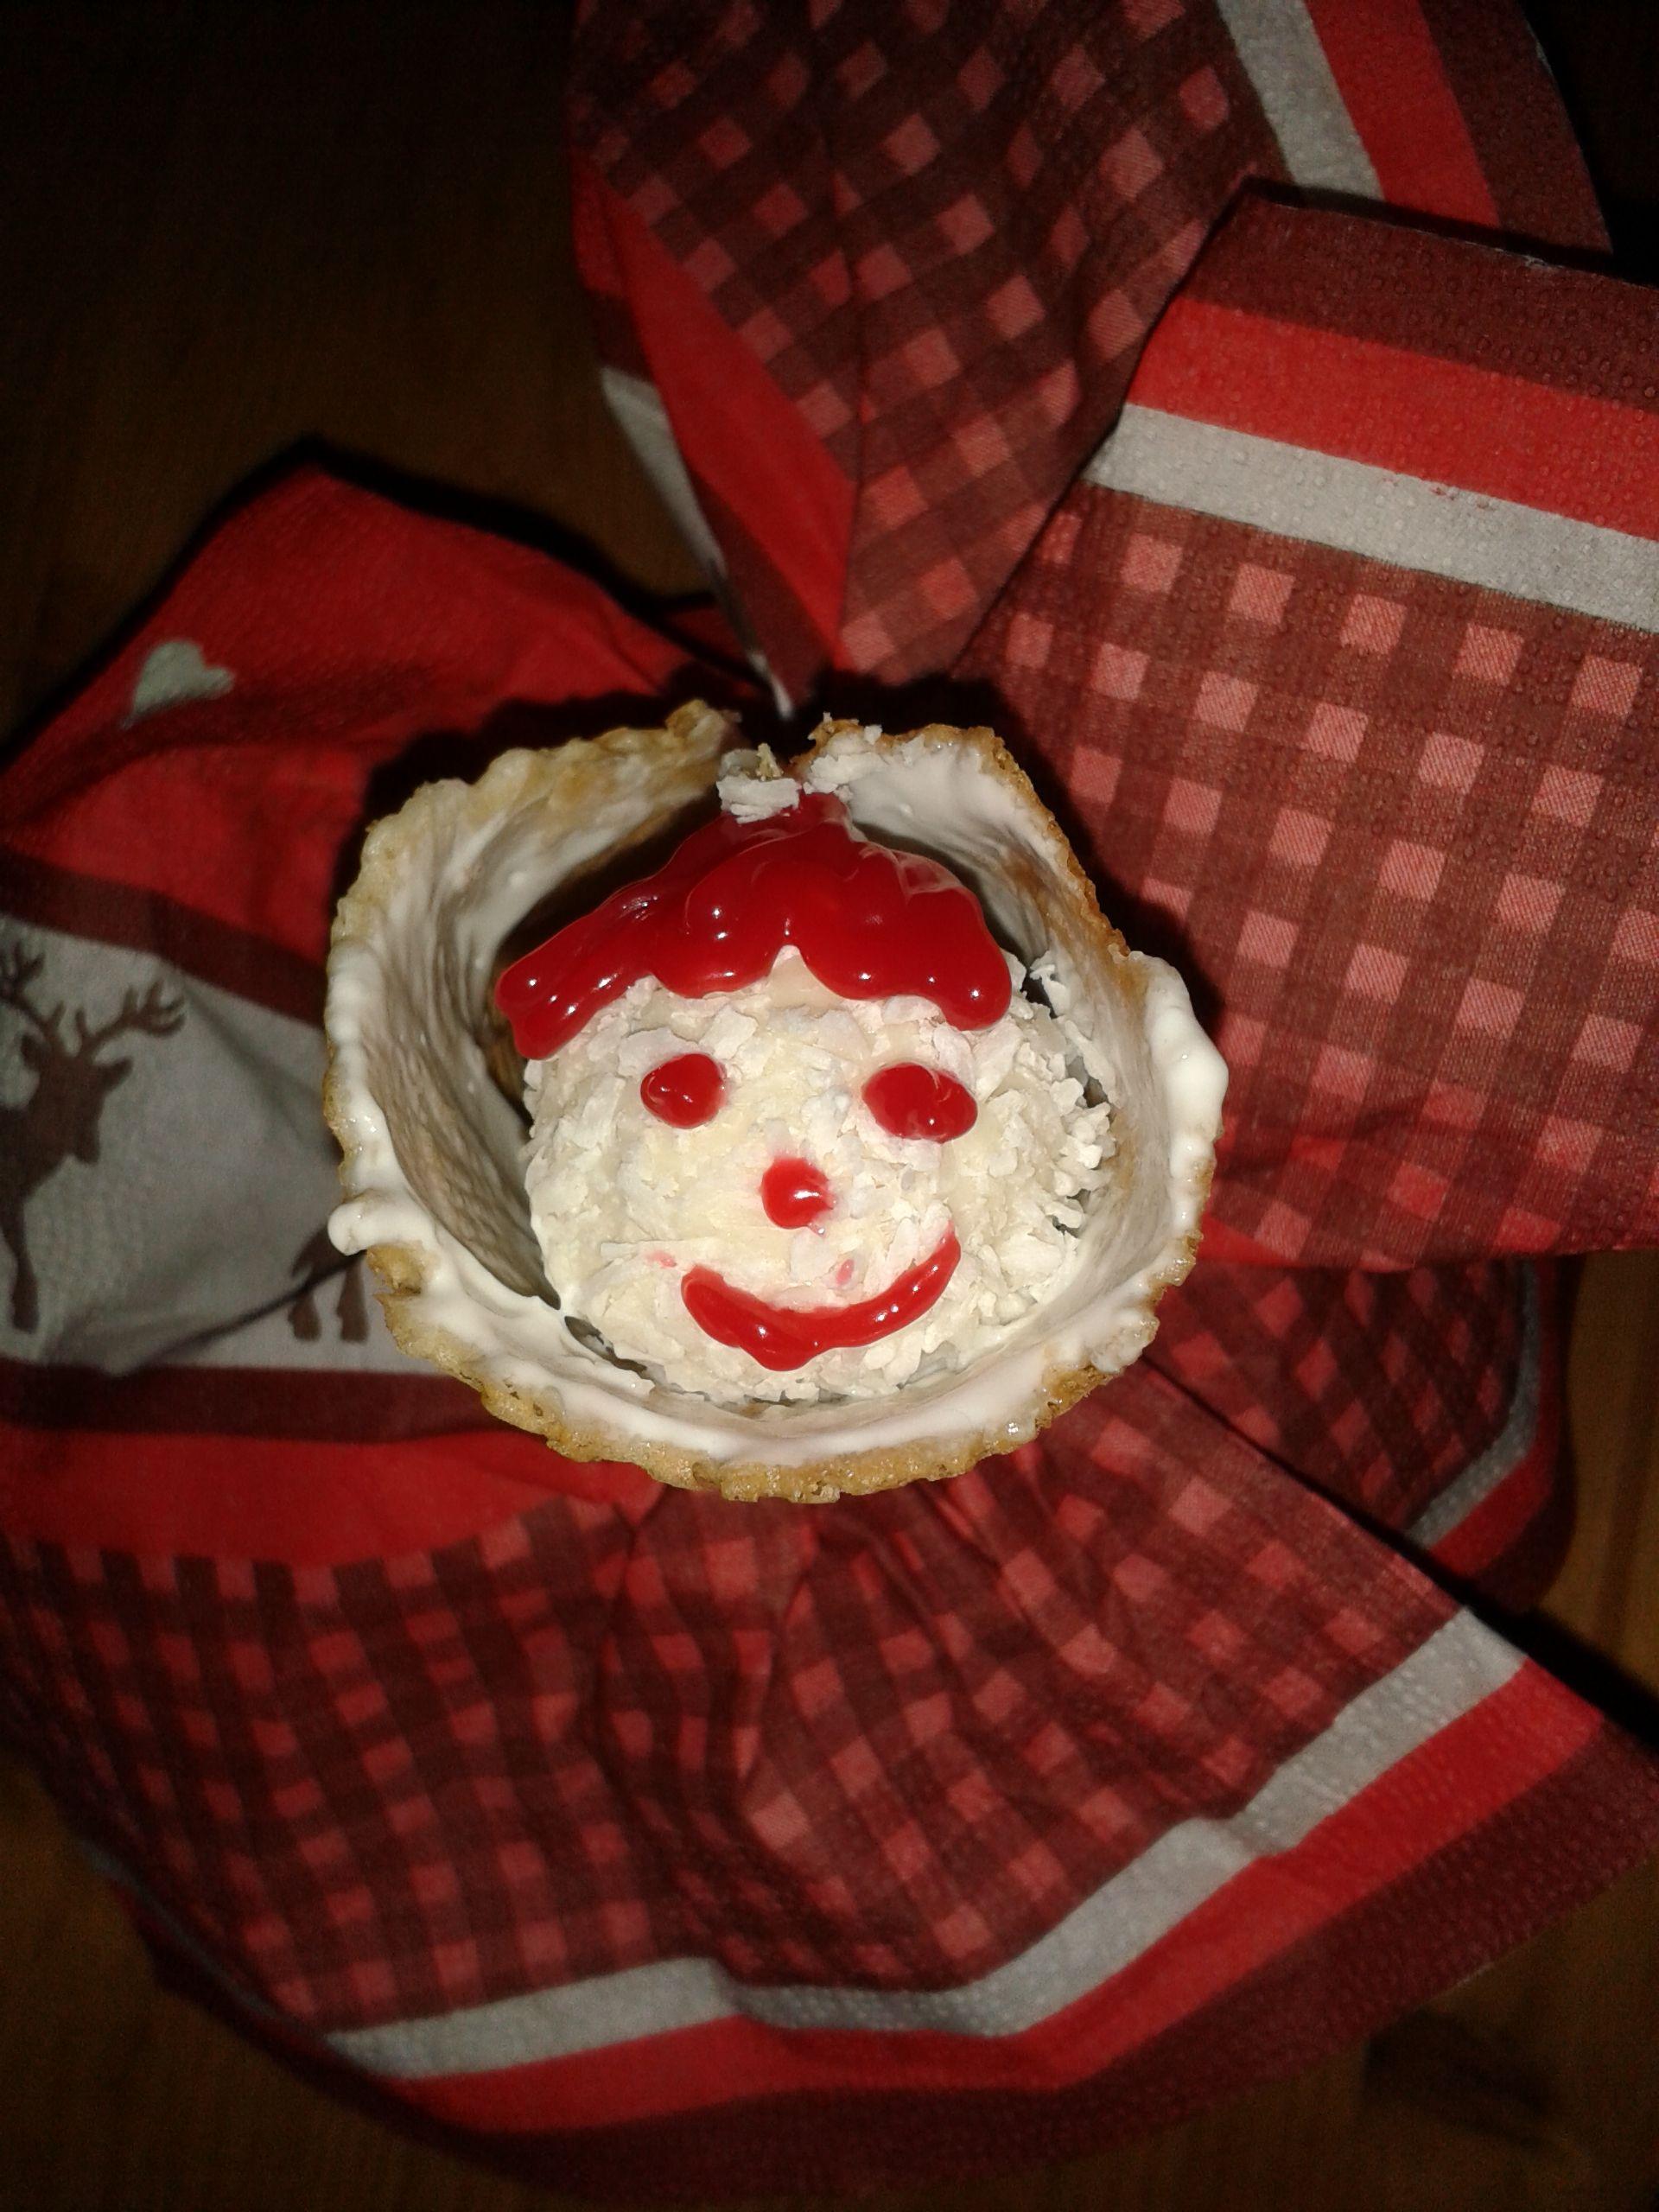 #LisaFreundeskreis #Raffaello Süße Waffeltüte mit Raffaello ;)